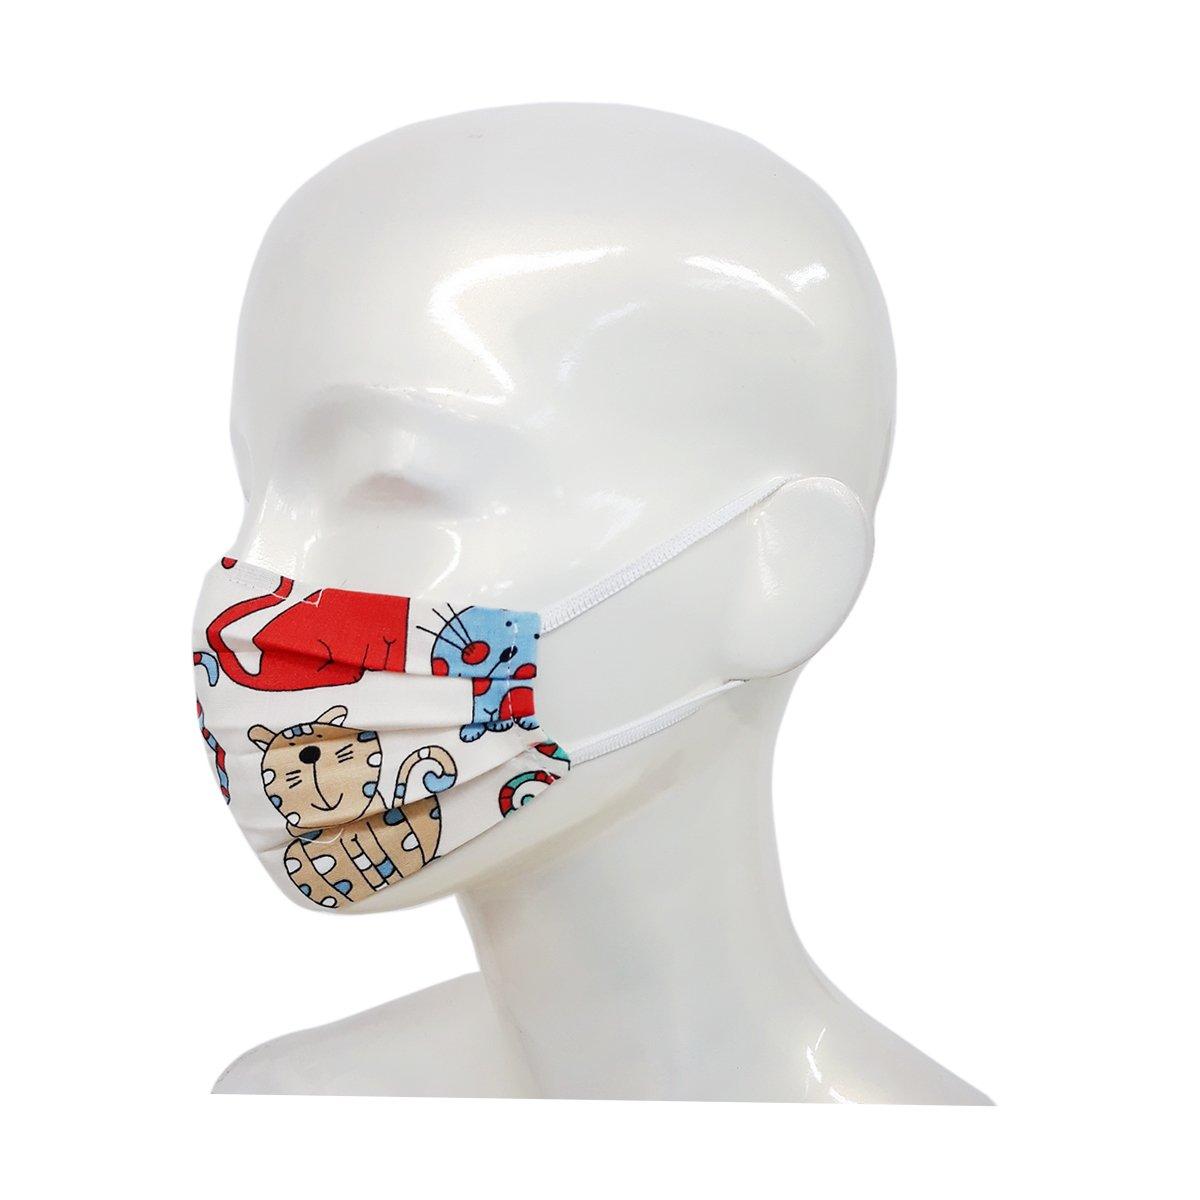 Set 4 bucati, Masca de fata, copii 3-6 ani, forma anatomica, reutilizabila, Noriel, Pisicute imagine